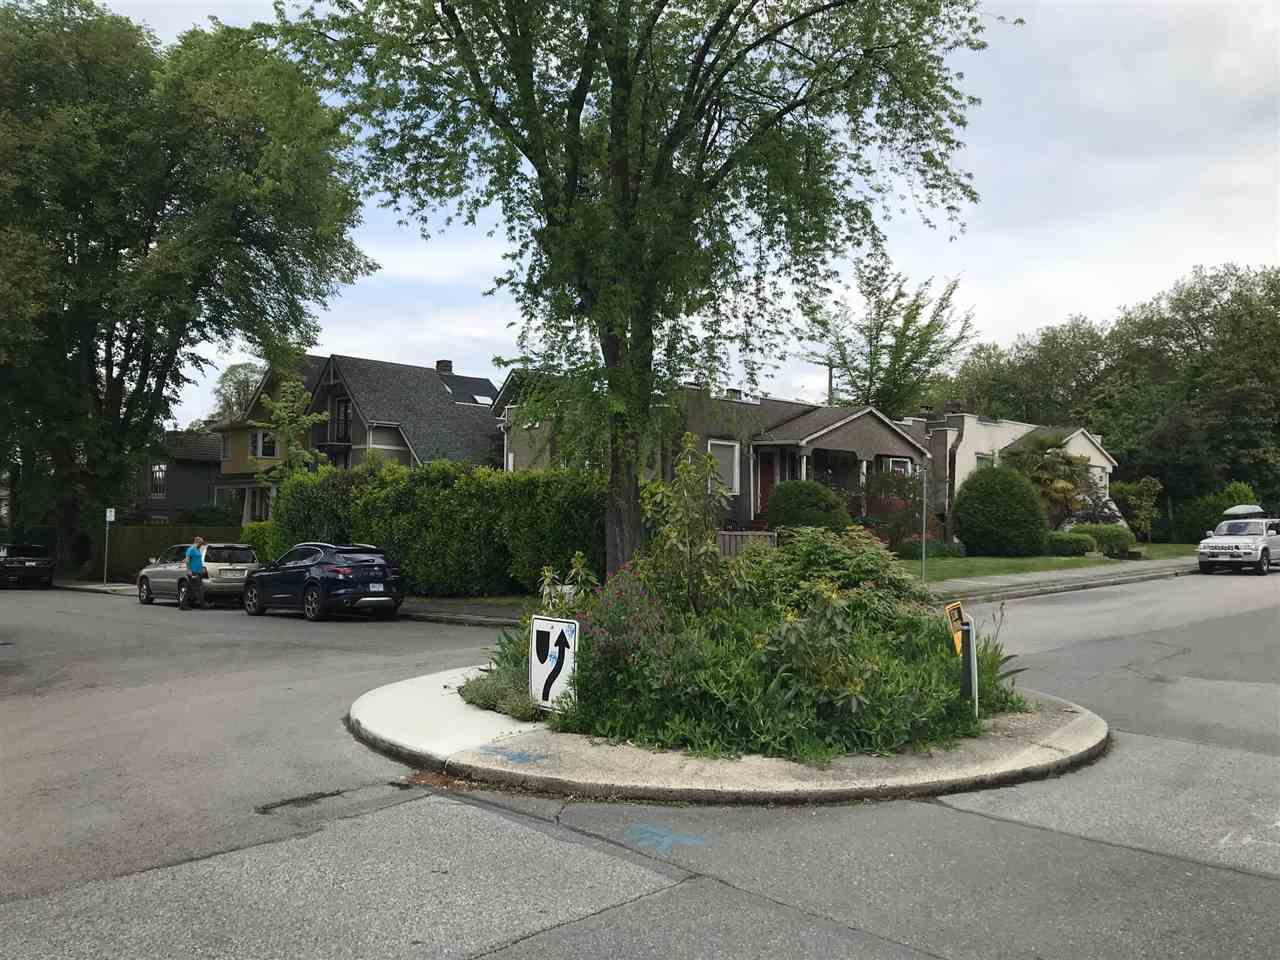 1155 MAPLE STREET - MLS® # R2456628